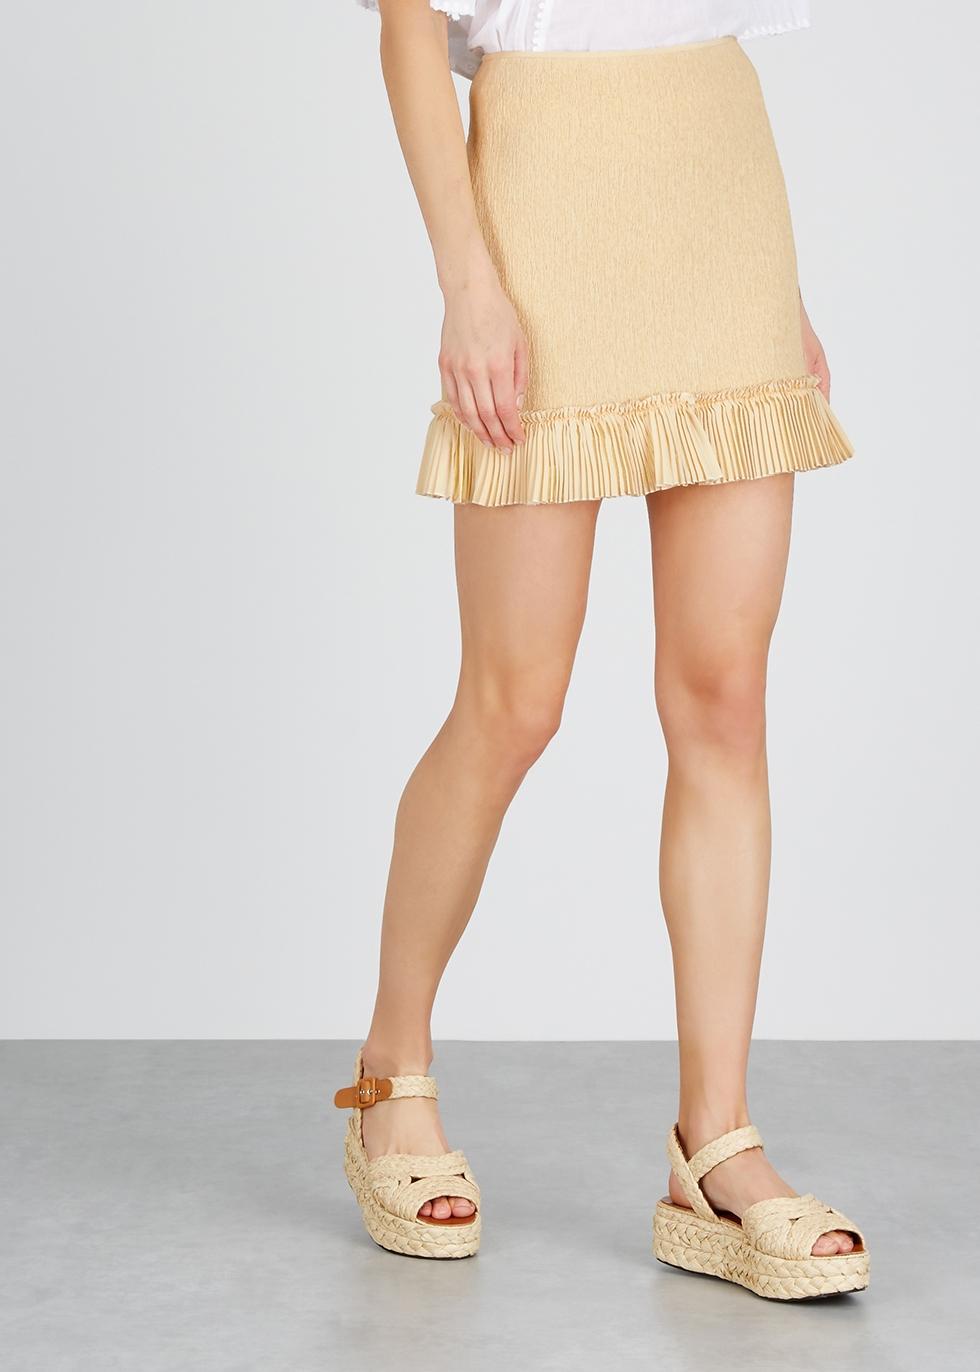 Sand plissé mini skirt - Chloé